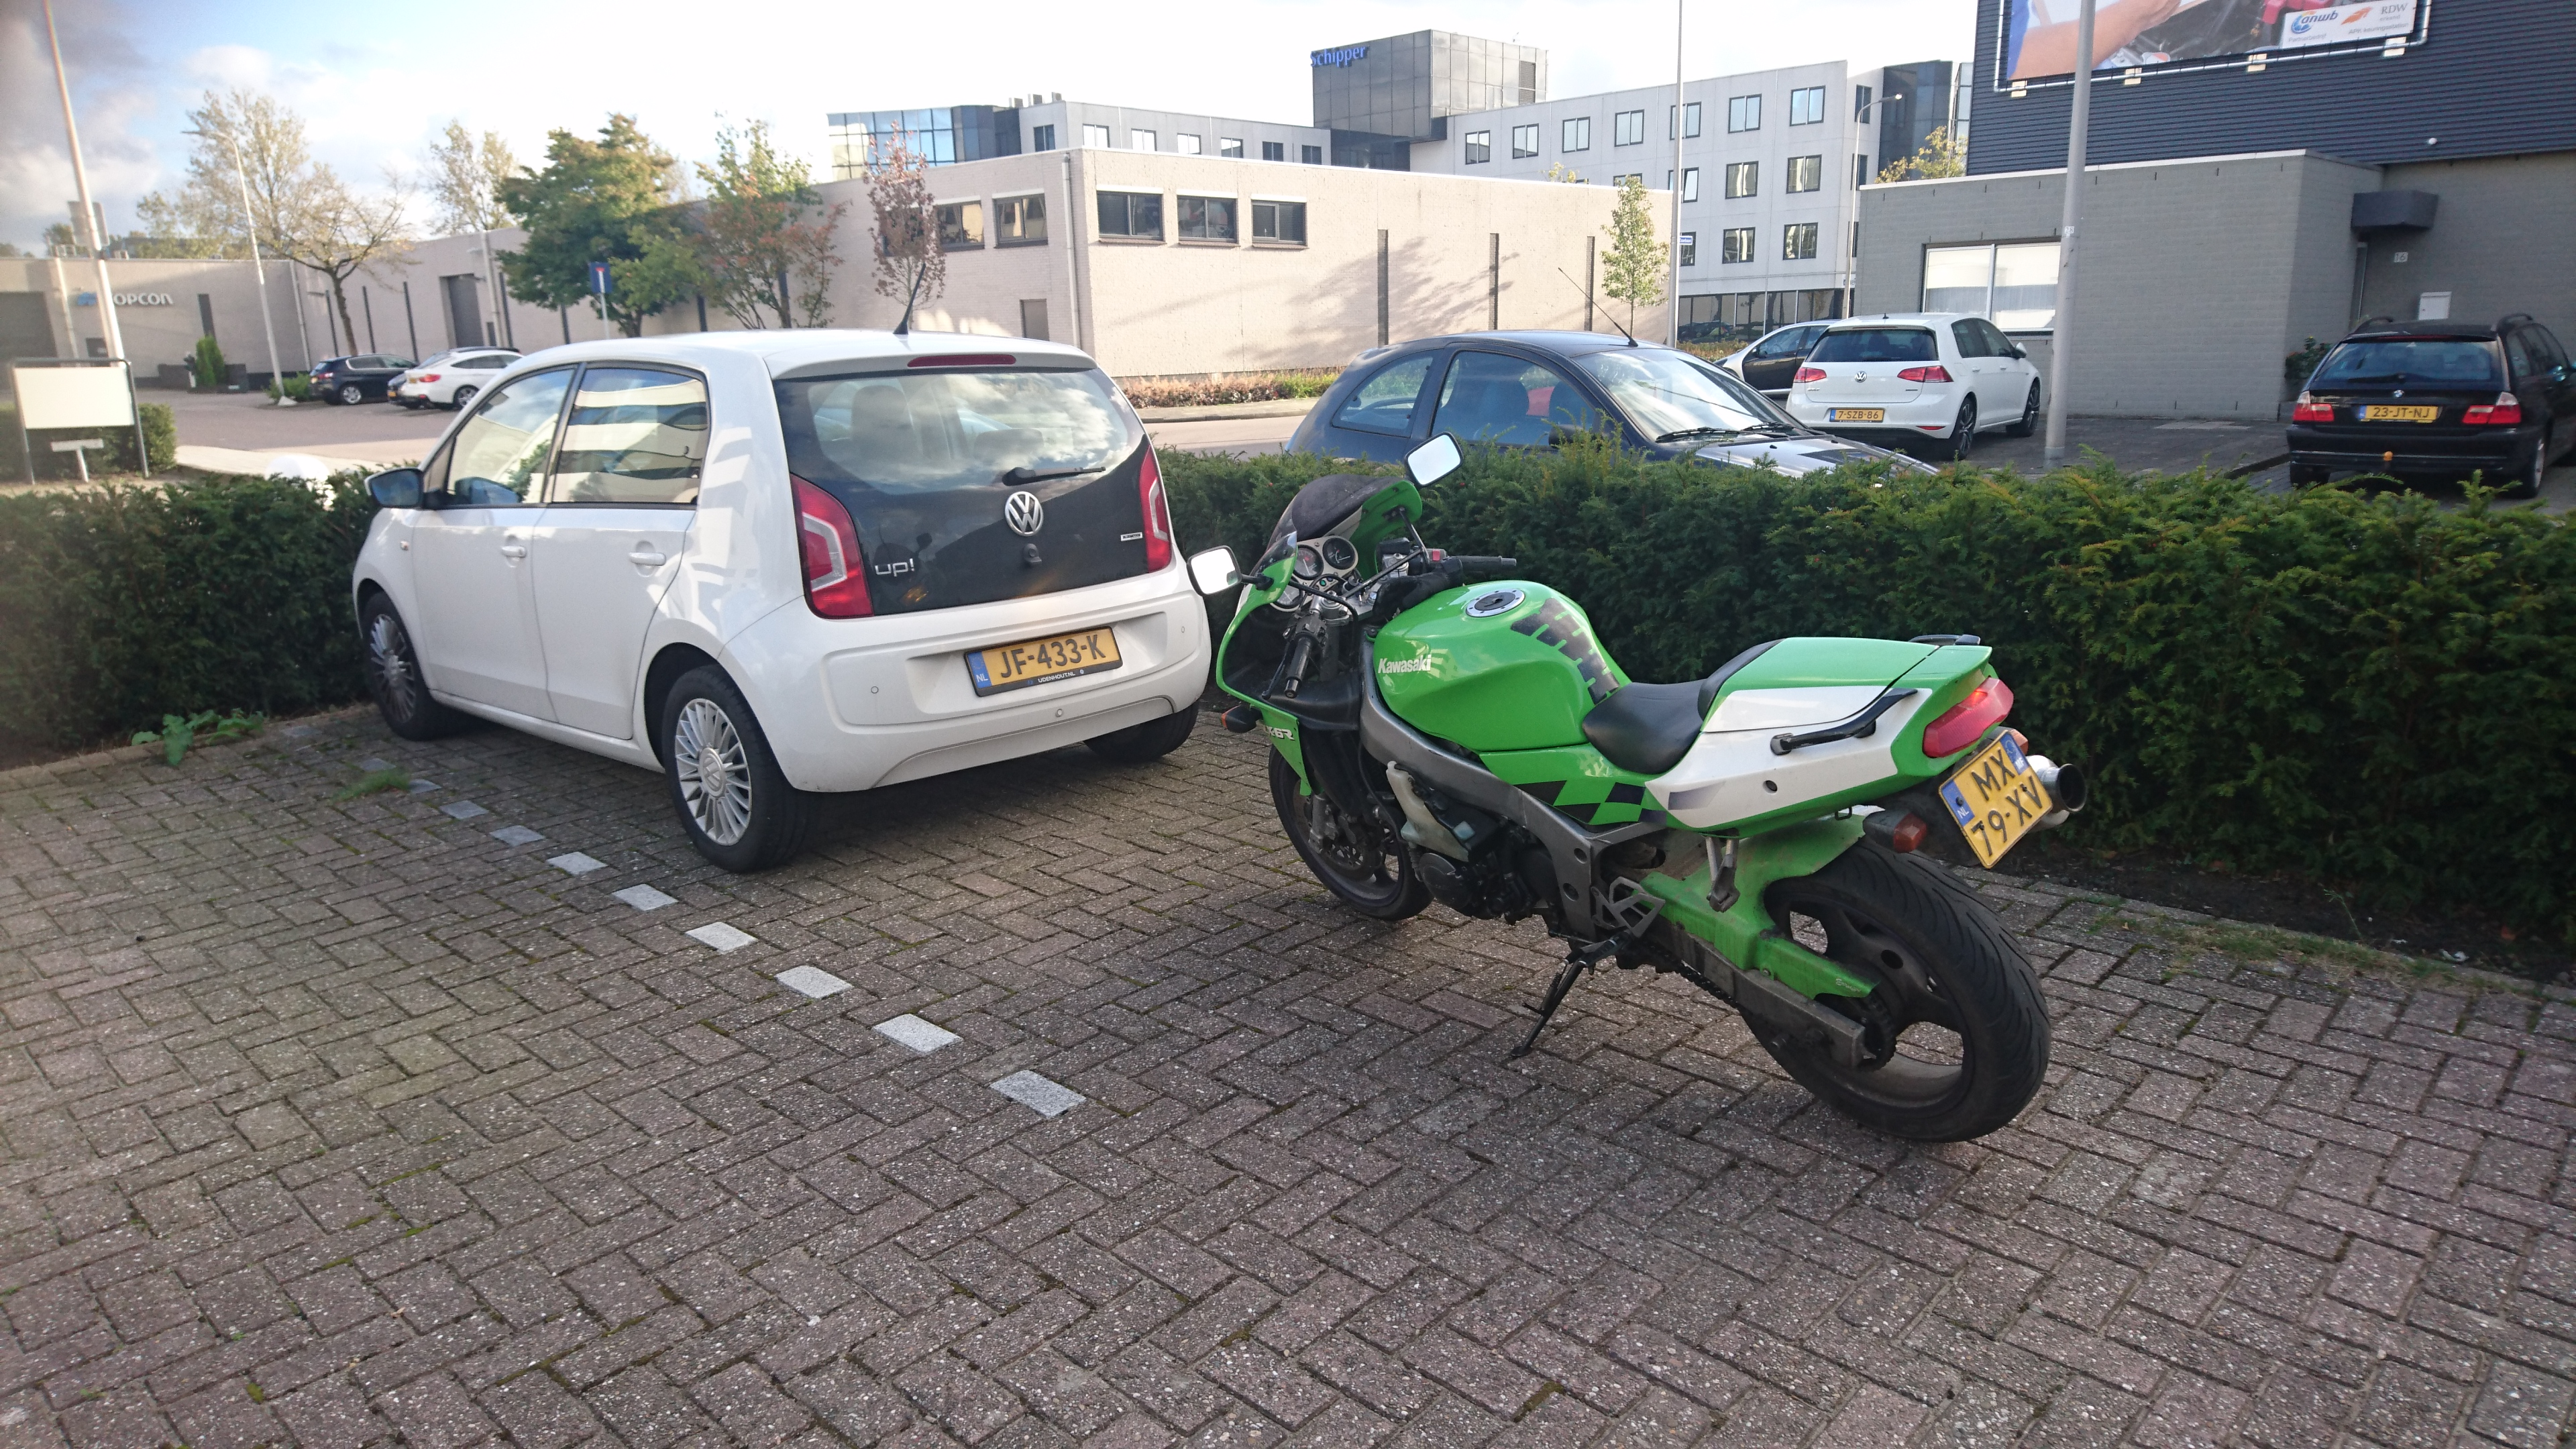 http://piczwart.nl/moto/punten/622.jpg